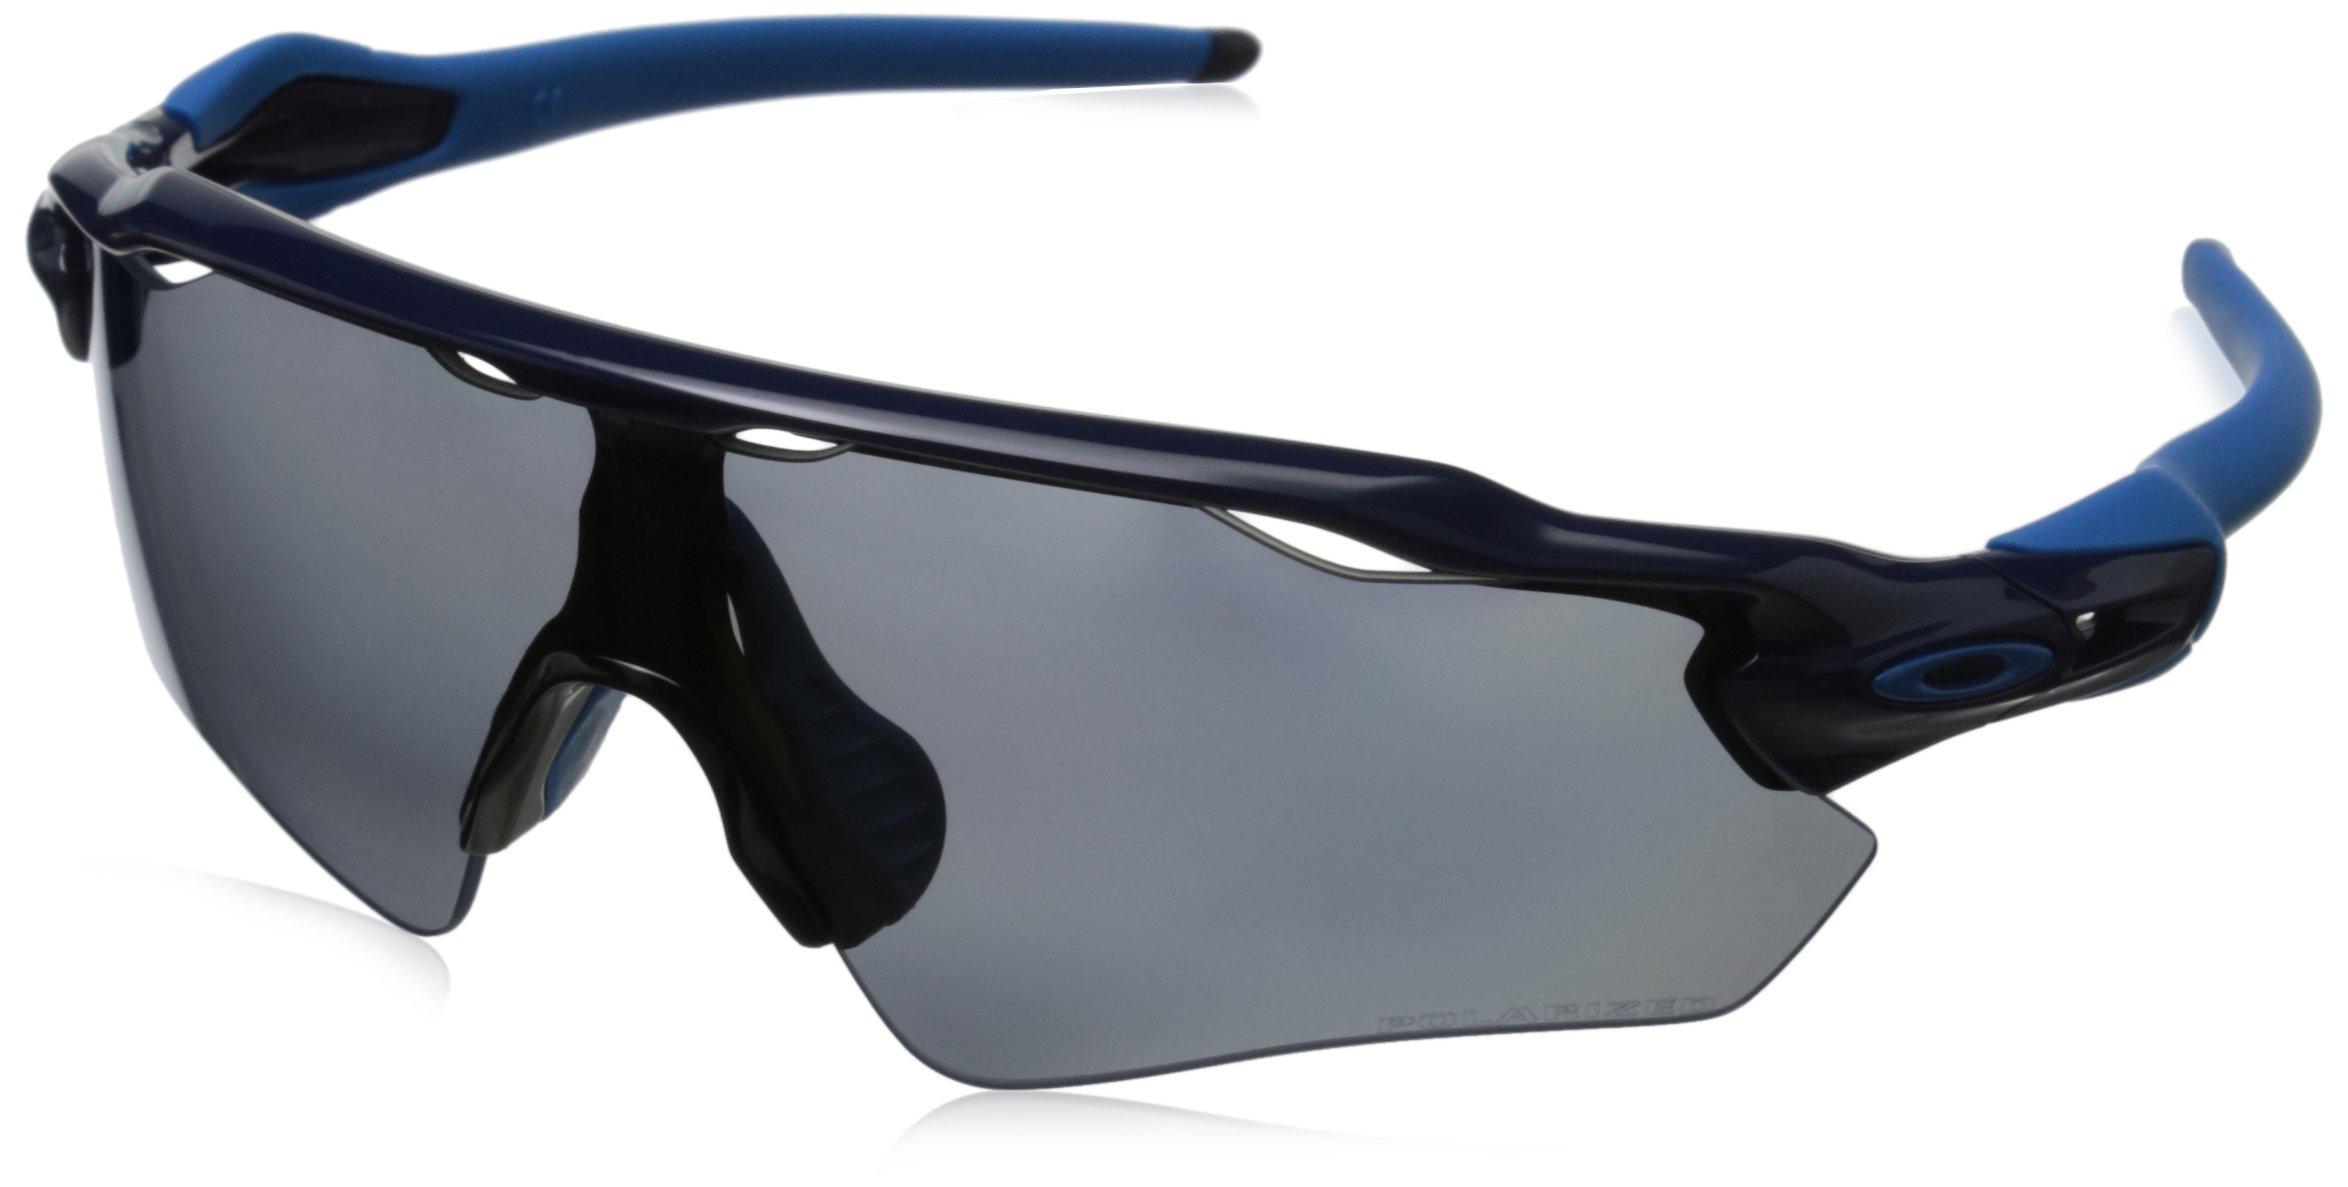 Oakley Men's Radar OO9208-06 Shield Sunglasses, Navy, 138 mm